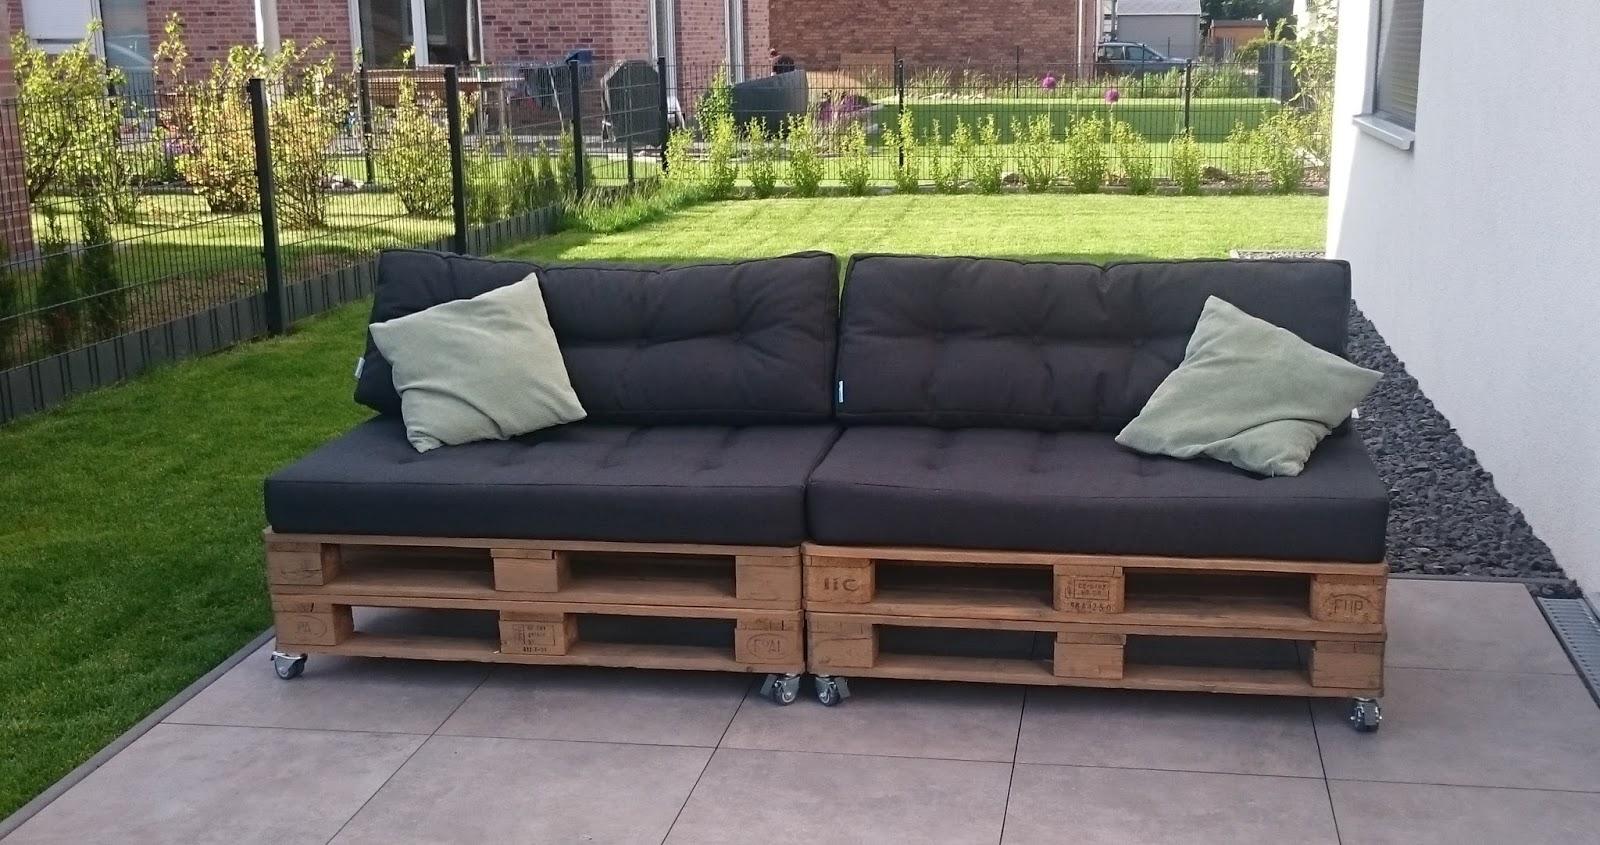 Stadtvilla in elmenhorst for Paletten sofa outdoor